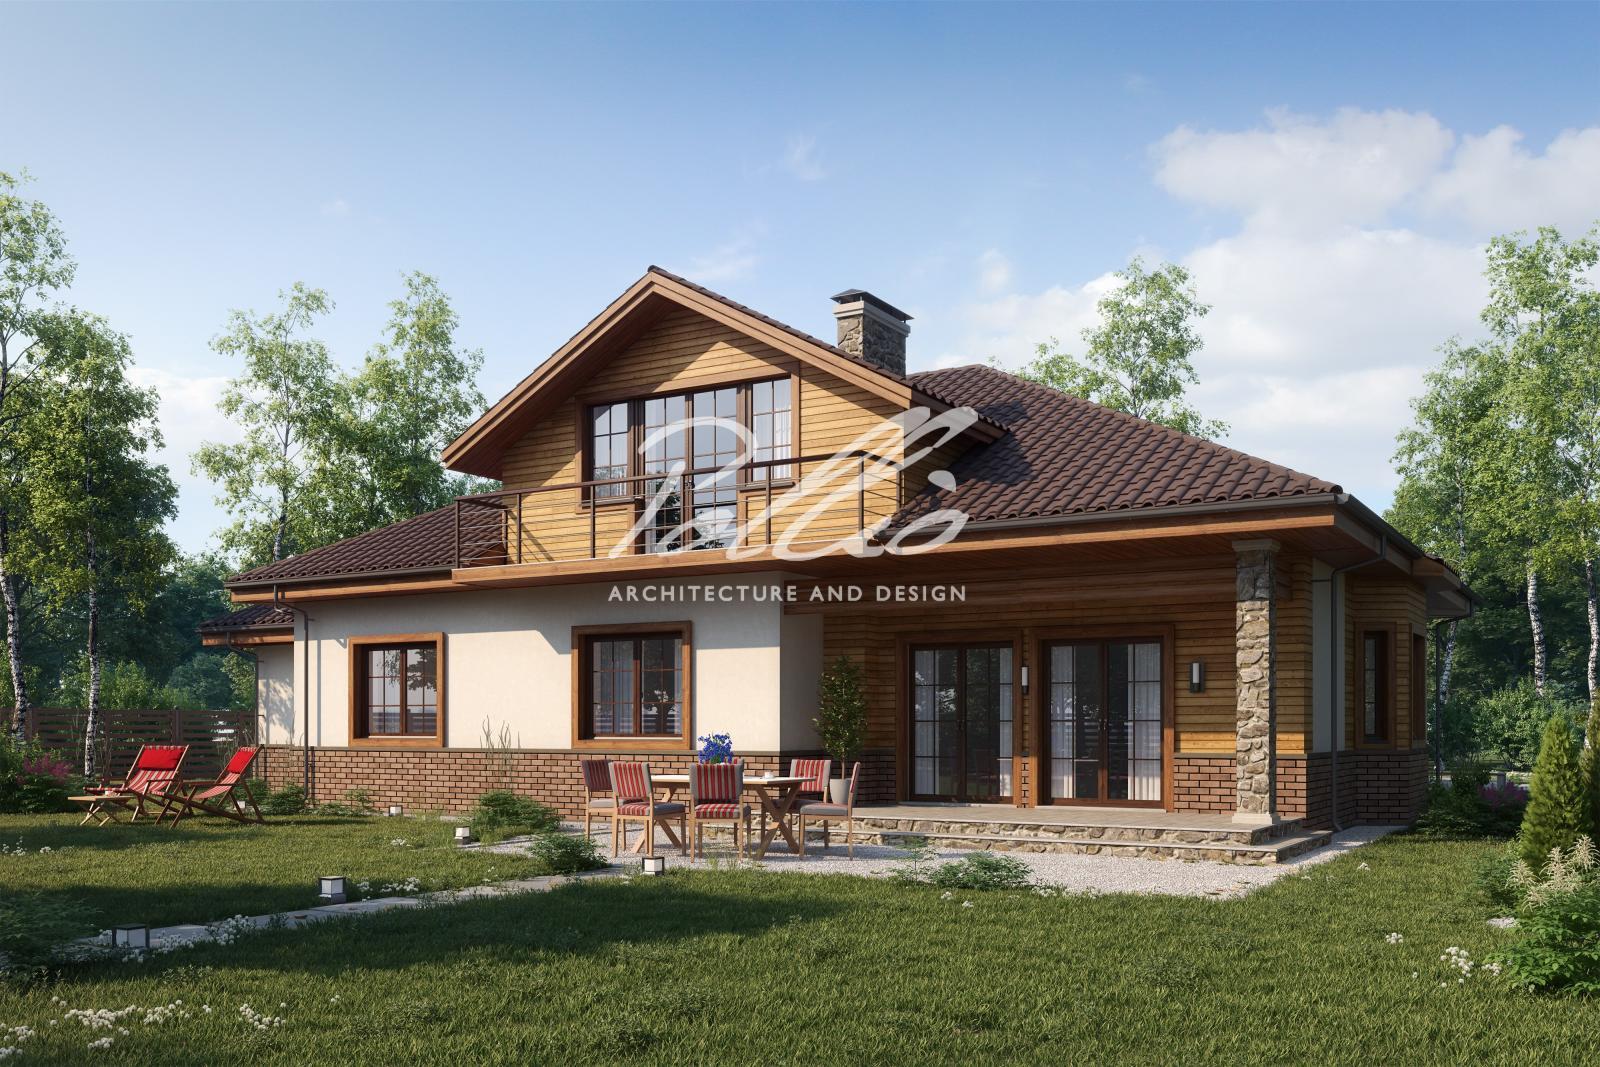 X1 A Классический проект мансардного дома с усовершенствованиями  фото 2